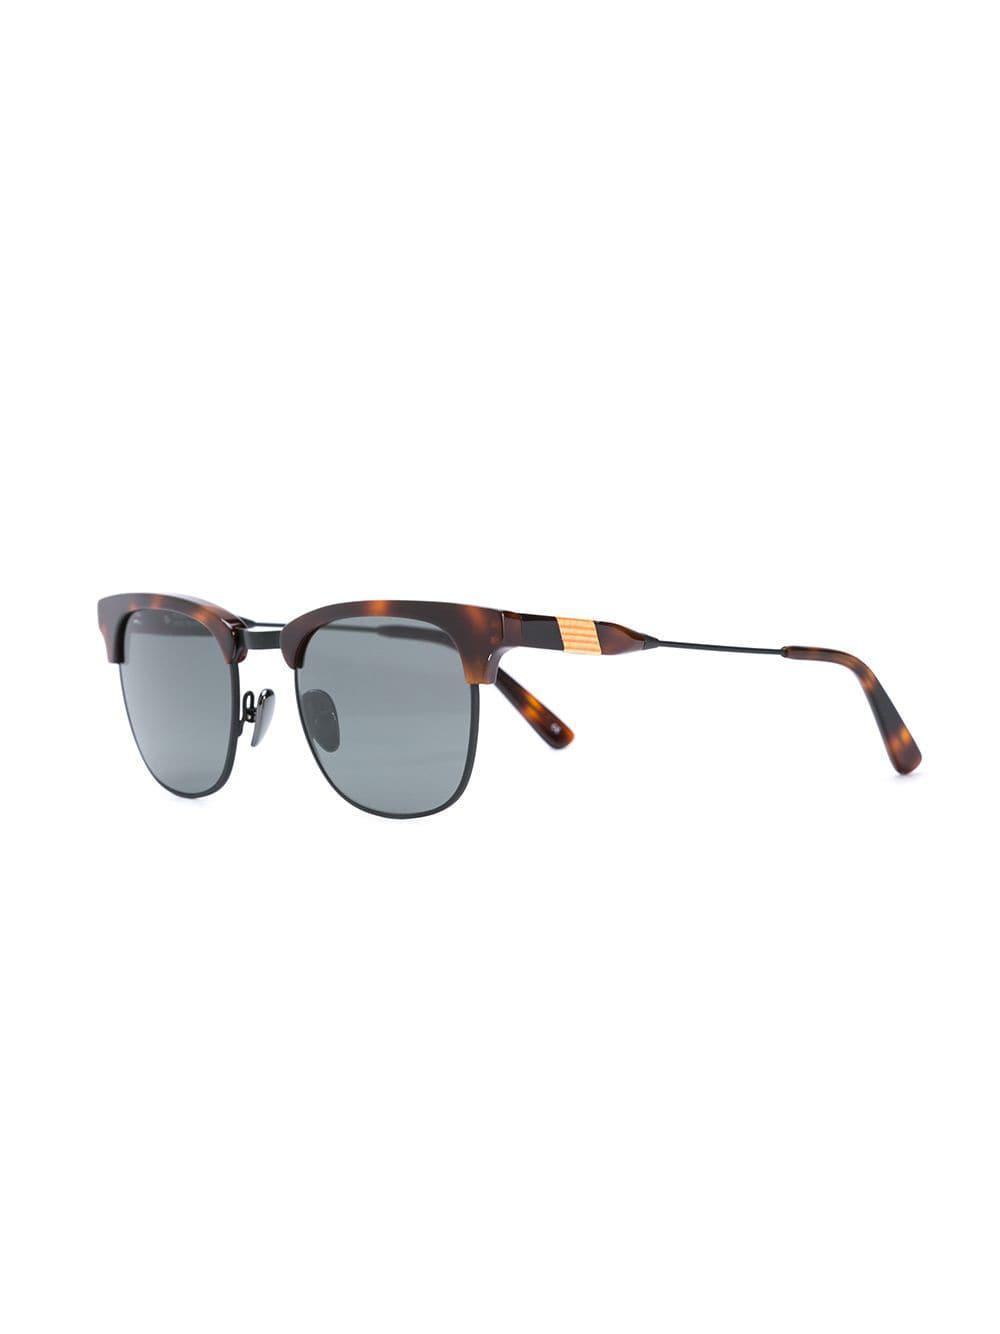 1a017e3baa2 Westward Leaning - Brown Vanguard 25 Sunglasses - Lyst. View fullscreen